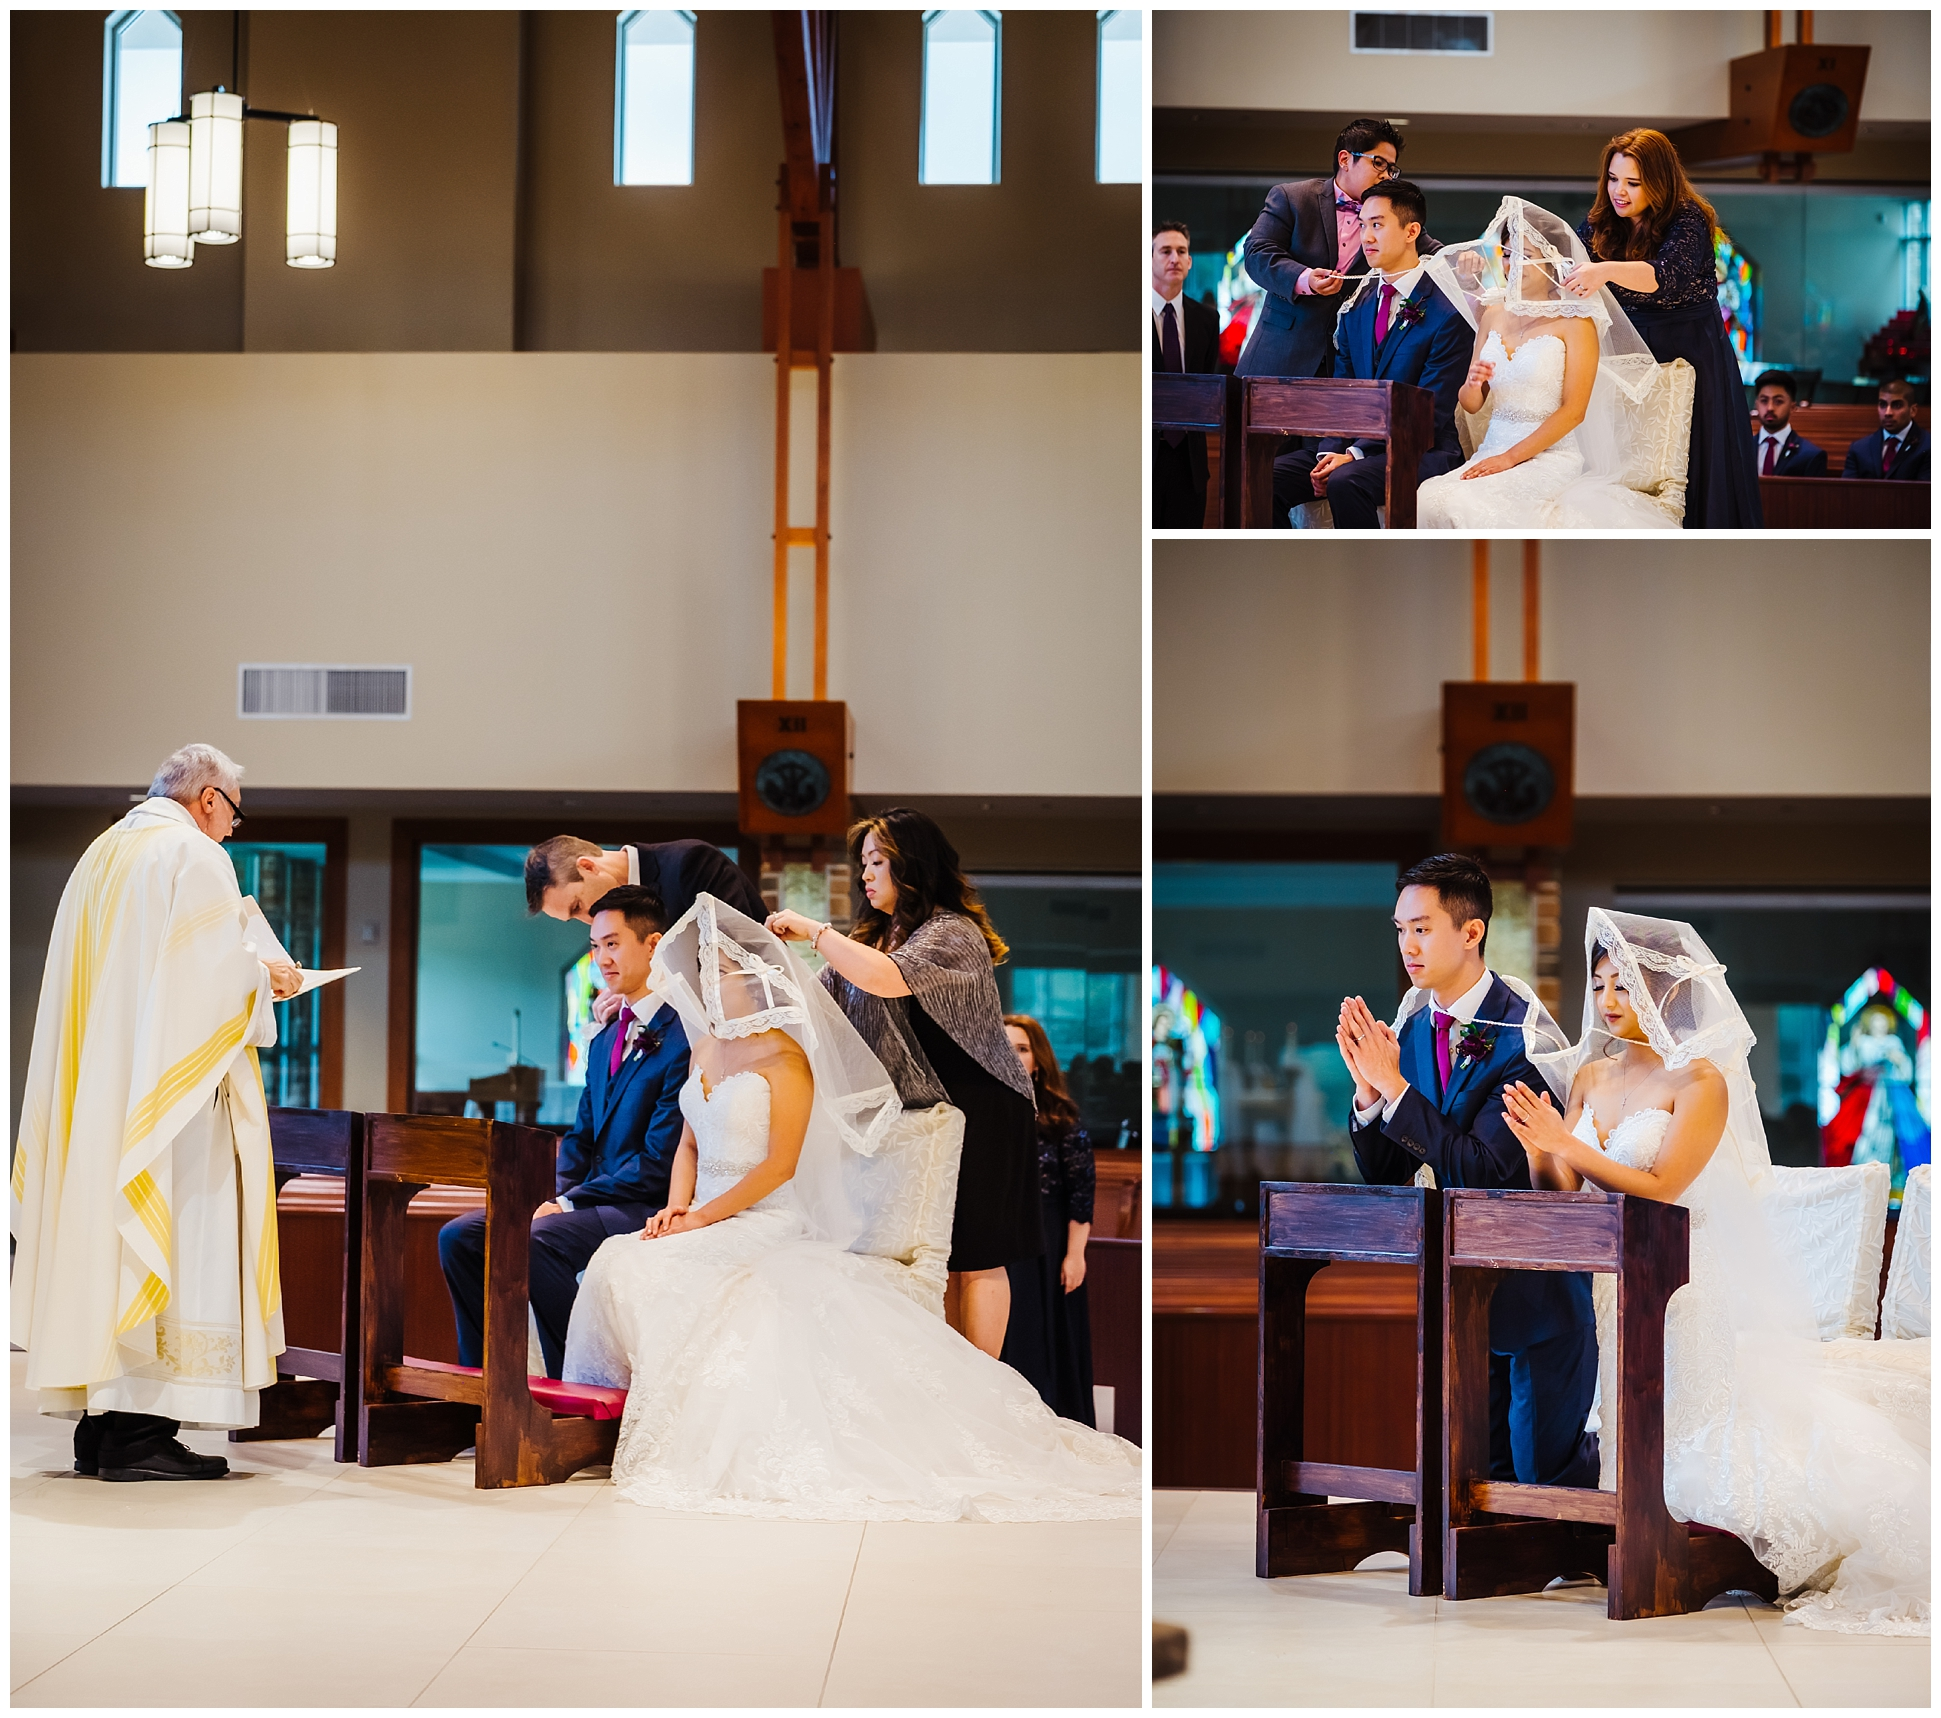 tampa-wedding-photographer-philipino-colorful-woods-ballroom-church-mass-confetti-fuscia_0036.jpg